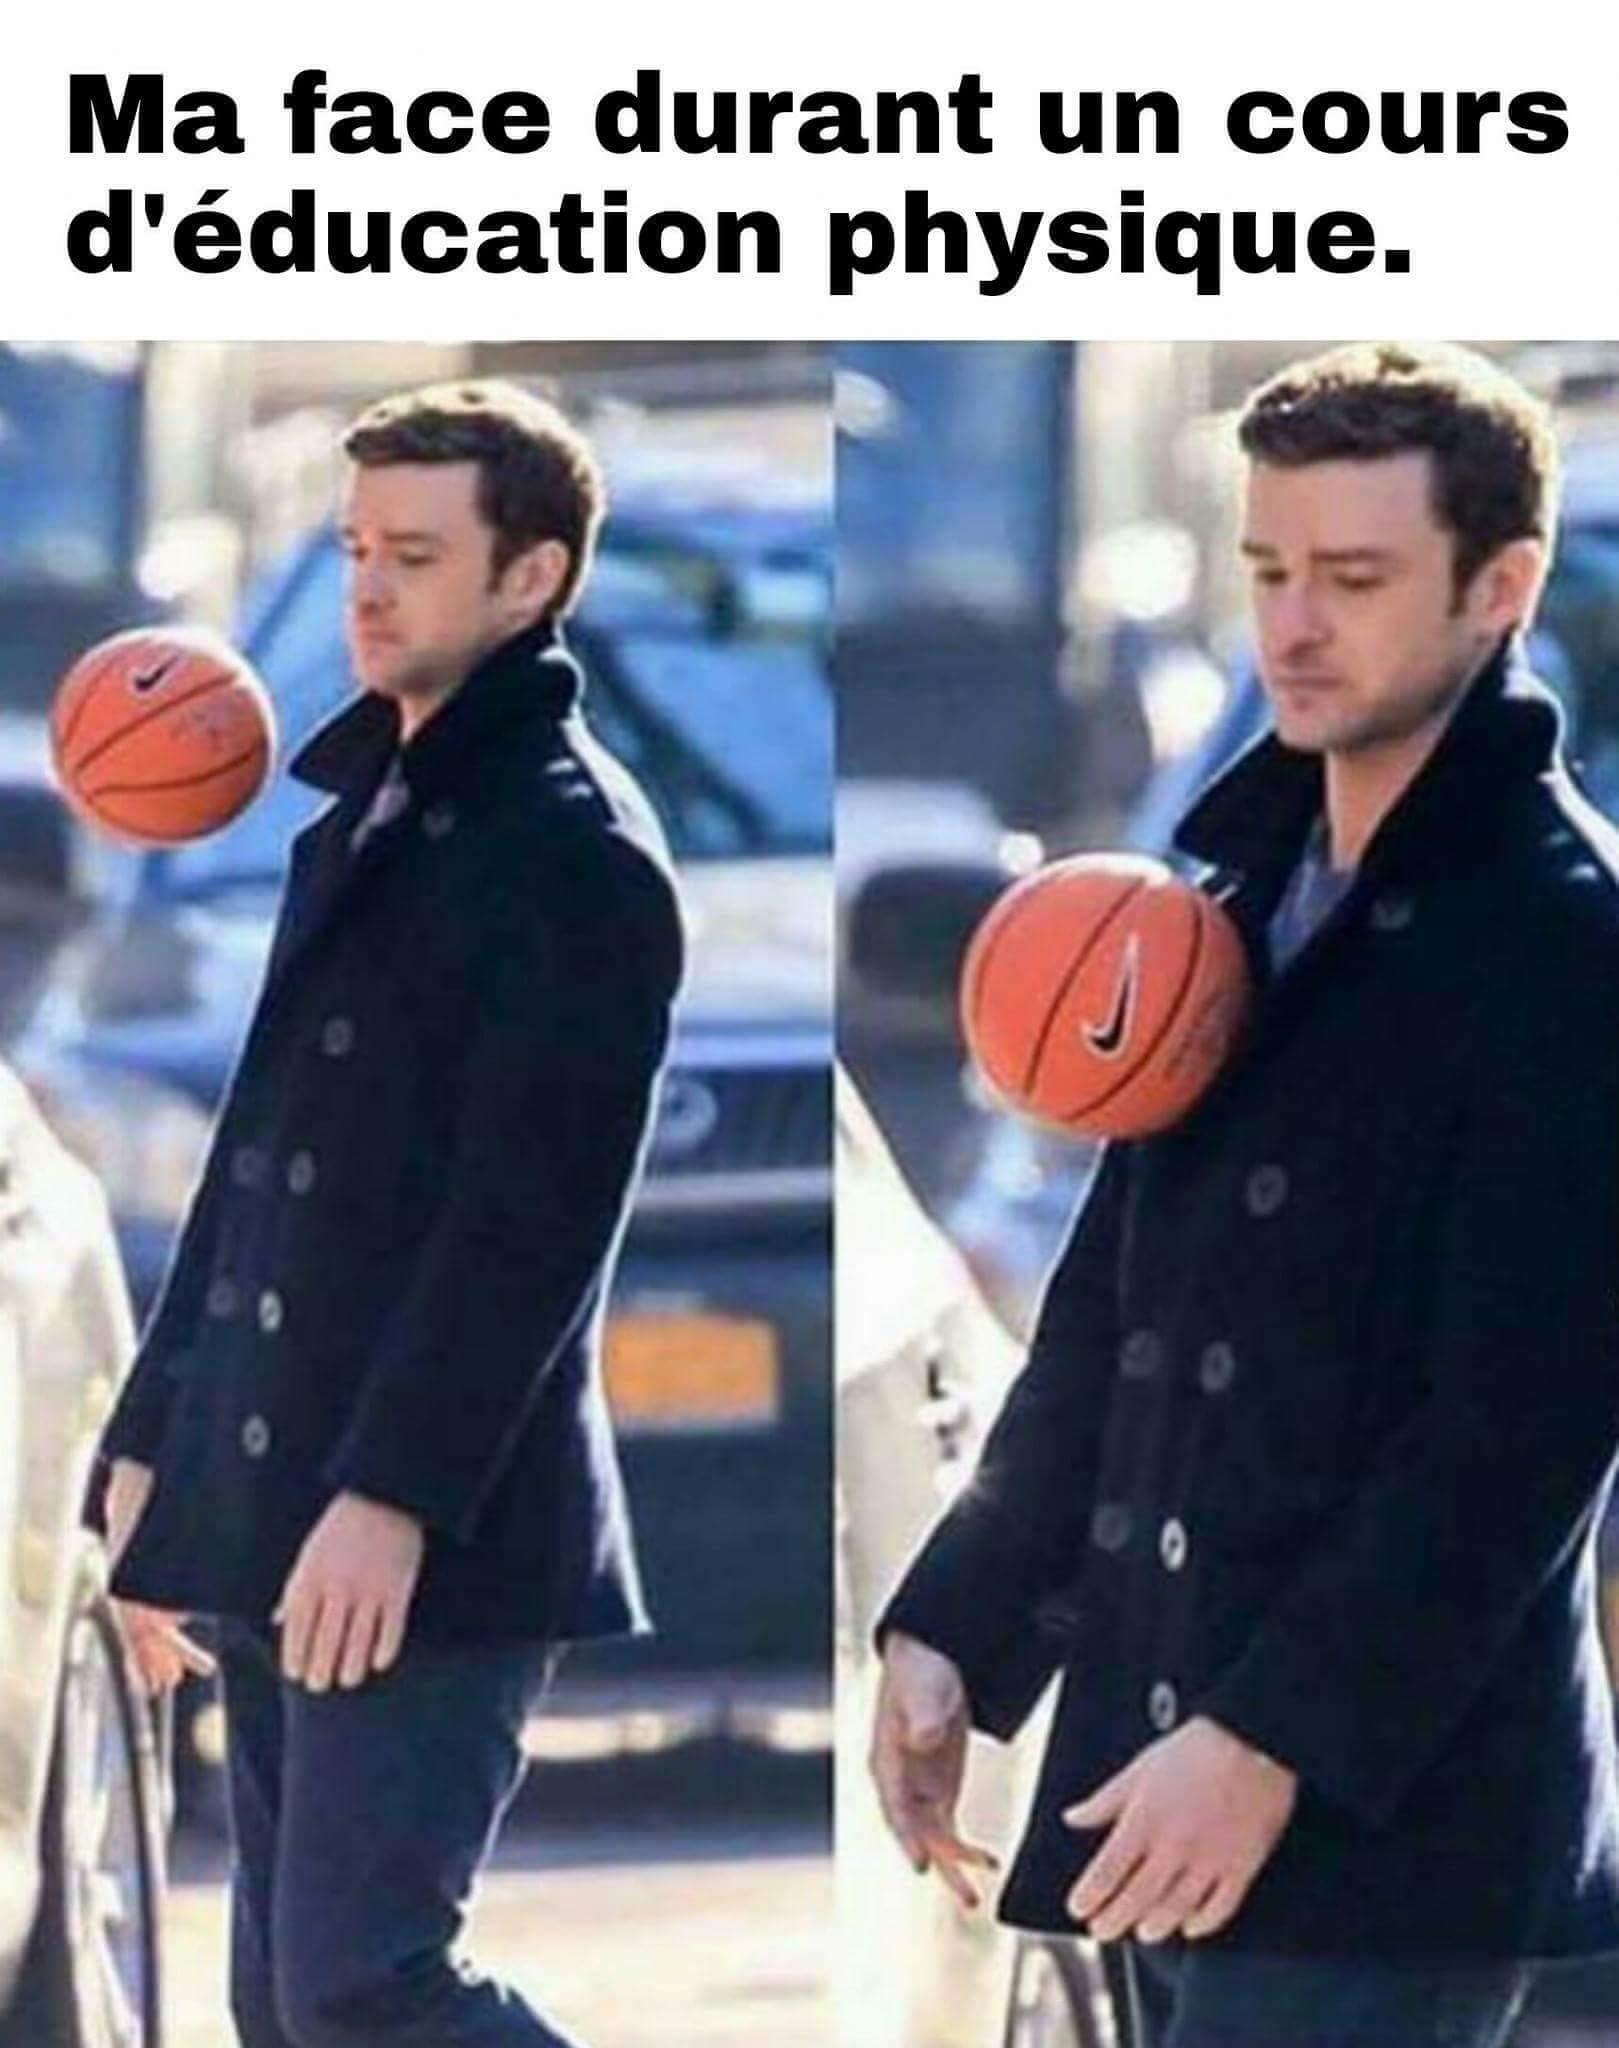 Educ - meme